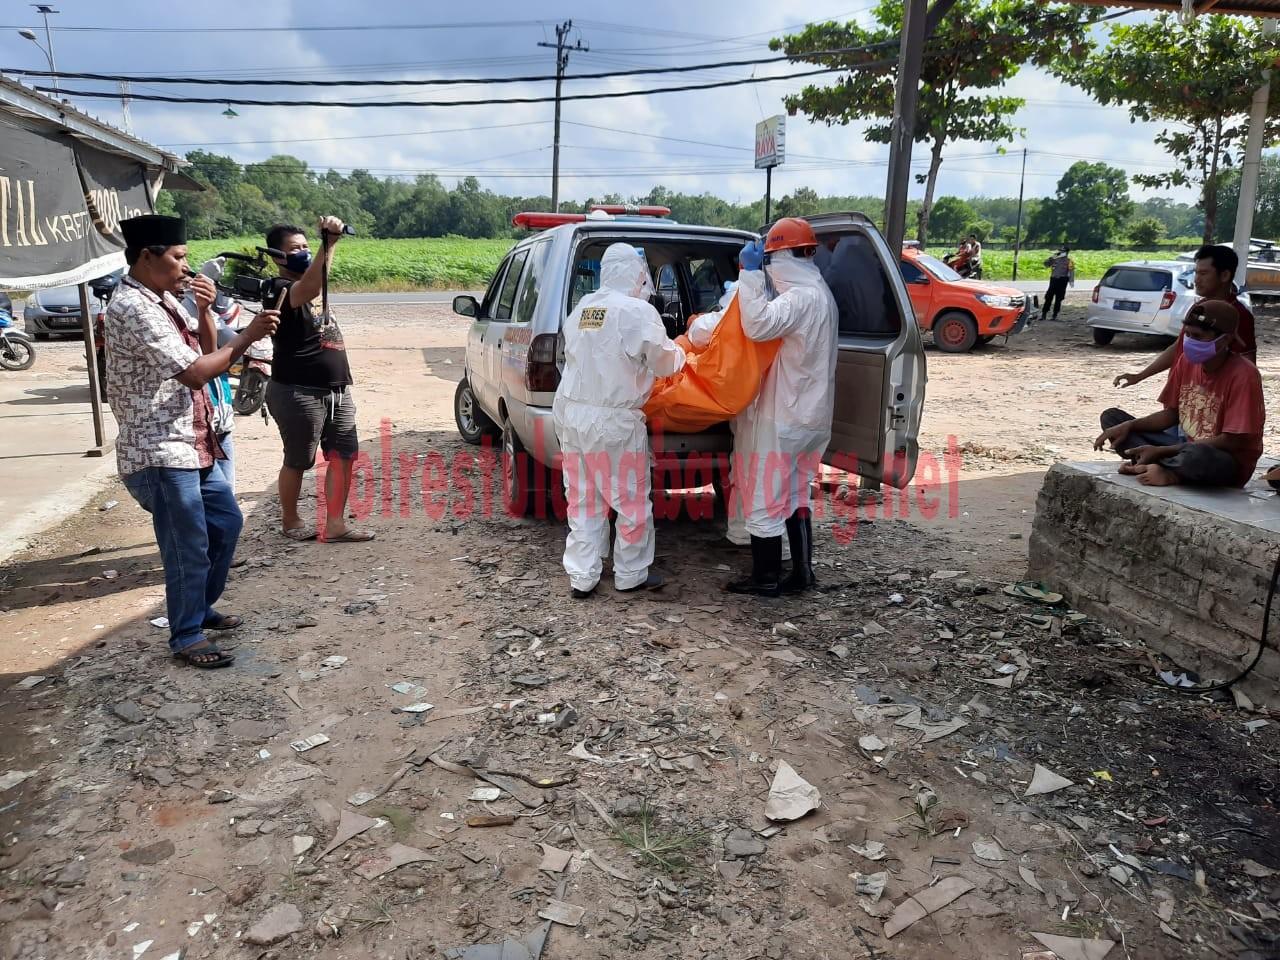 Jenazah korban di masukkan ke dalam mobil ambulance untuk dibawa ke RSUD Menggala